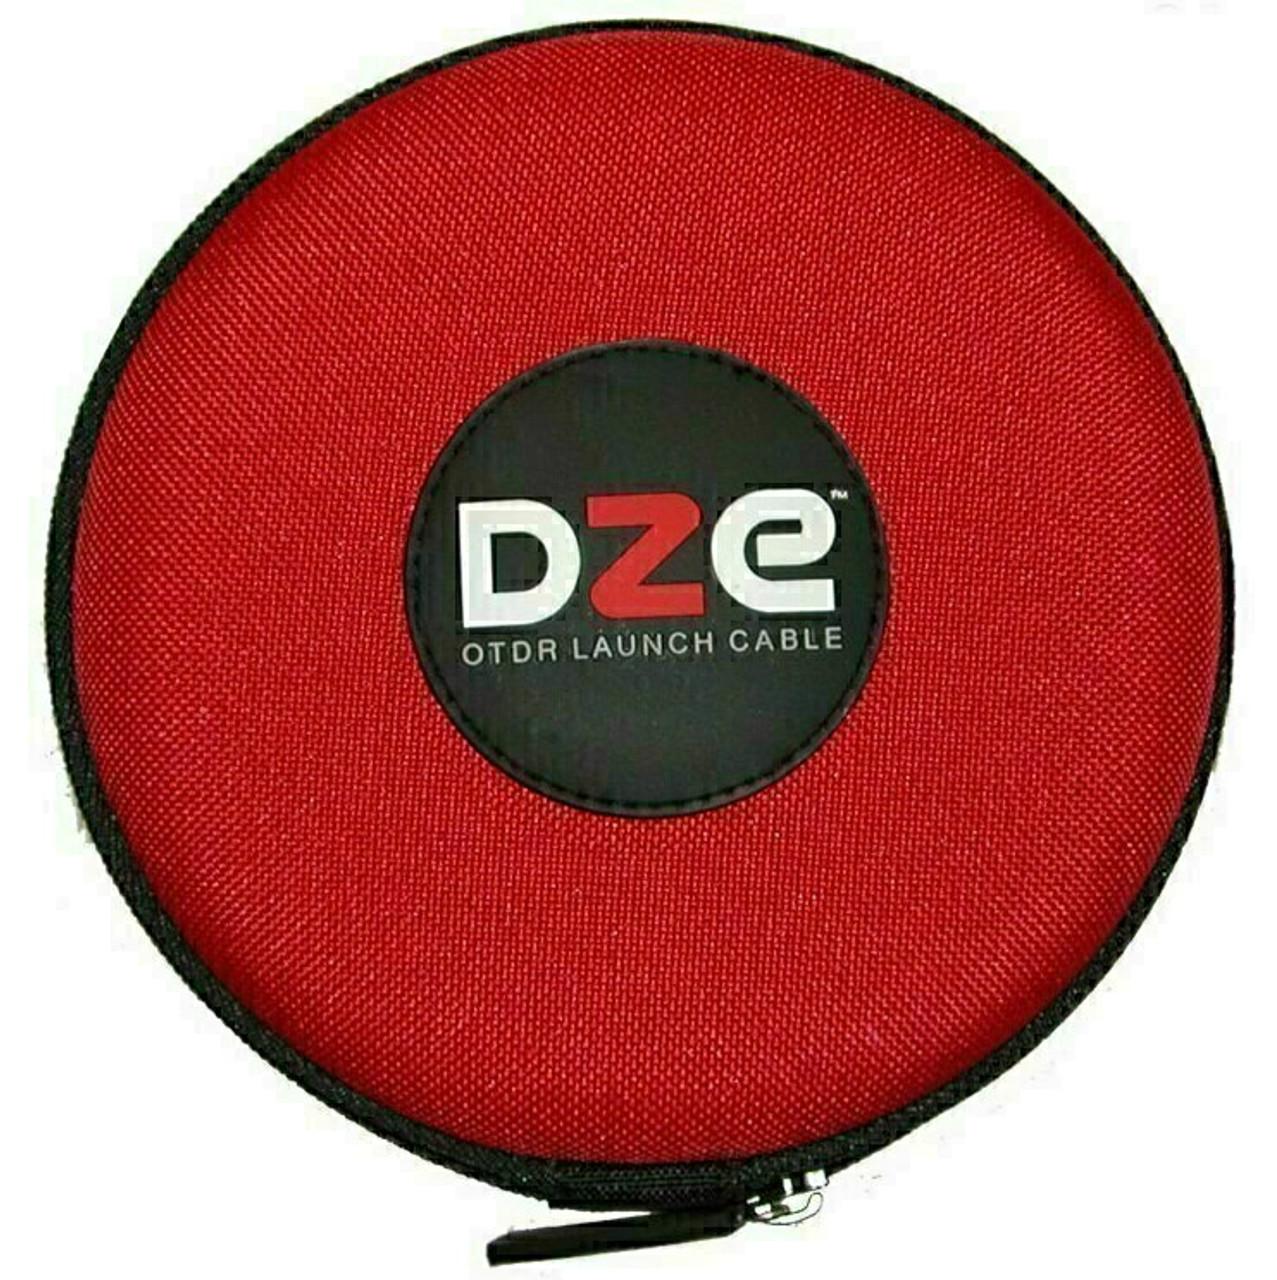 SC/APC - SC/APC Series 3 DZE OTDR Launch Cable, 1km, 1000 Meter Singlemode D355-S1000